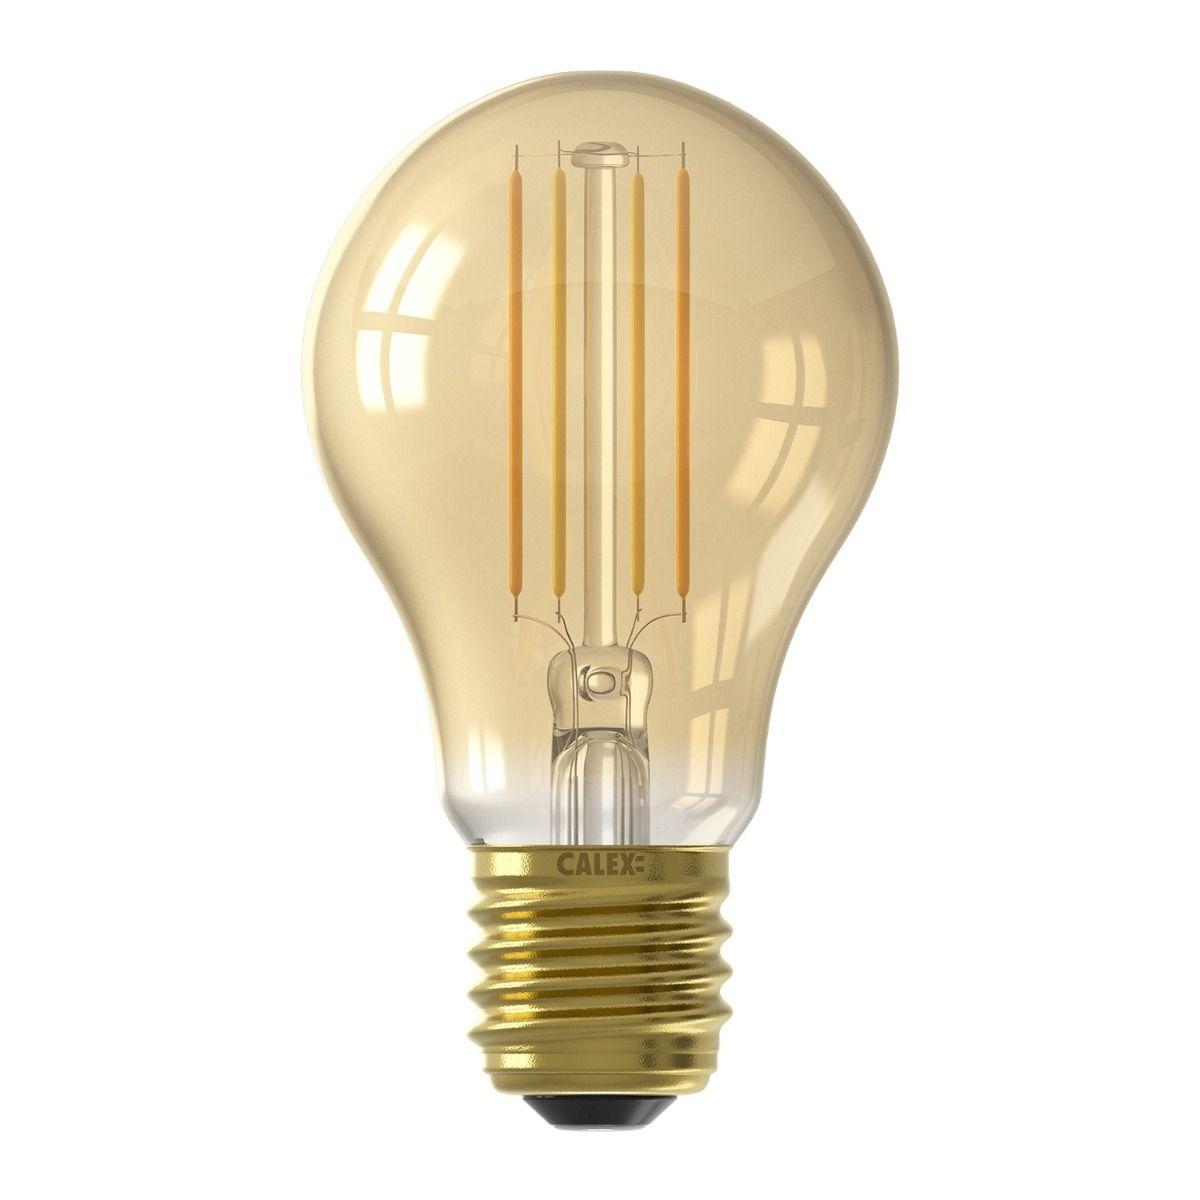 Calex Smart Standard E27 LED Glühbirne 7W 806lm 1800-3000K Fadenlampe | Tuya Wifi